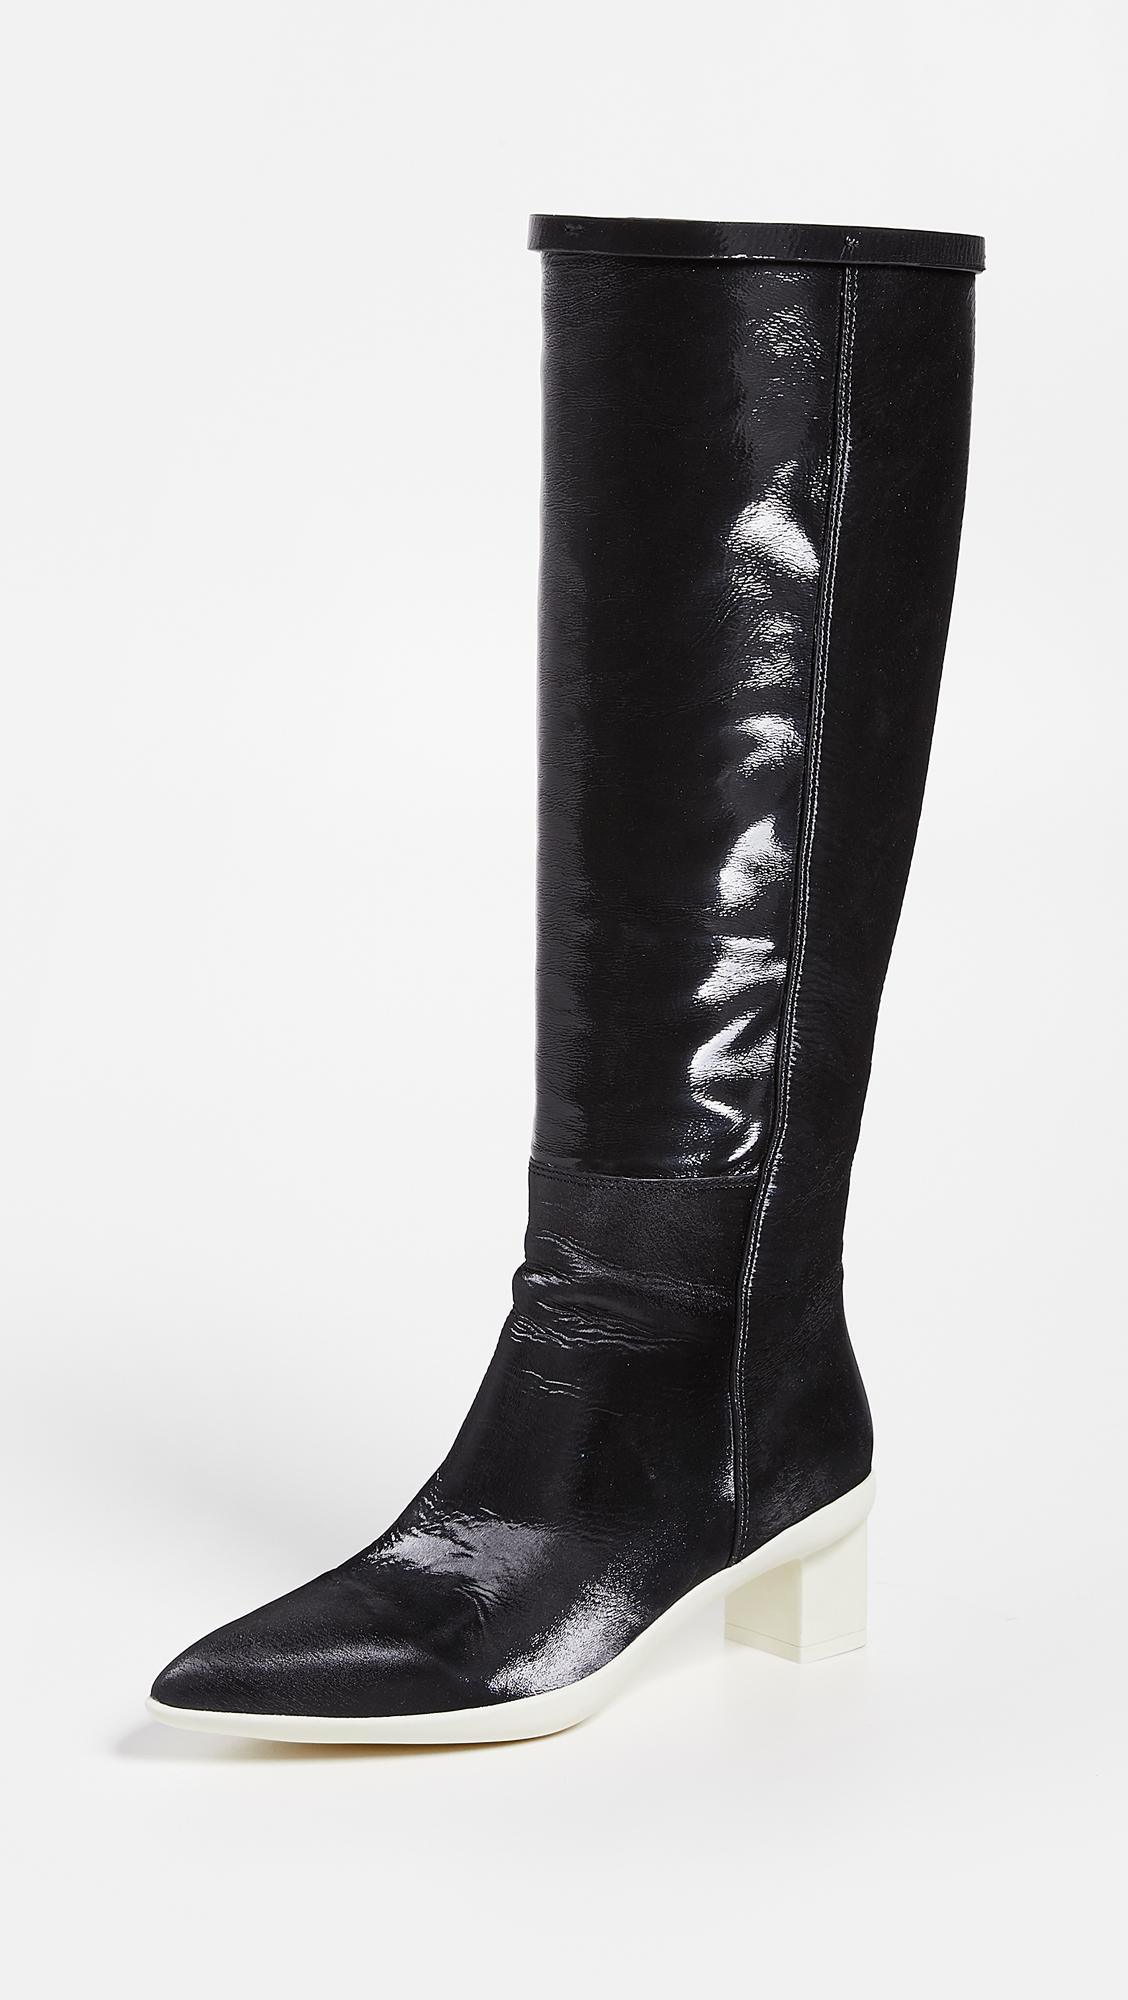 2a4cbd90c2b Lyst - Stuart Weitzman Claude 45mm Boots in Black